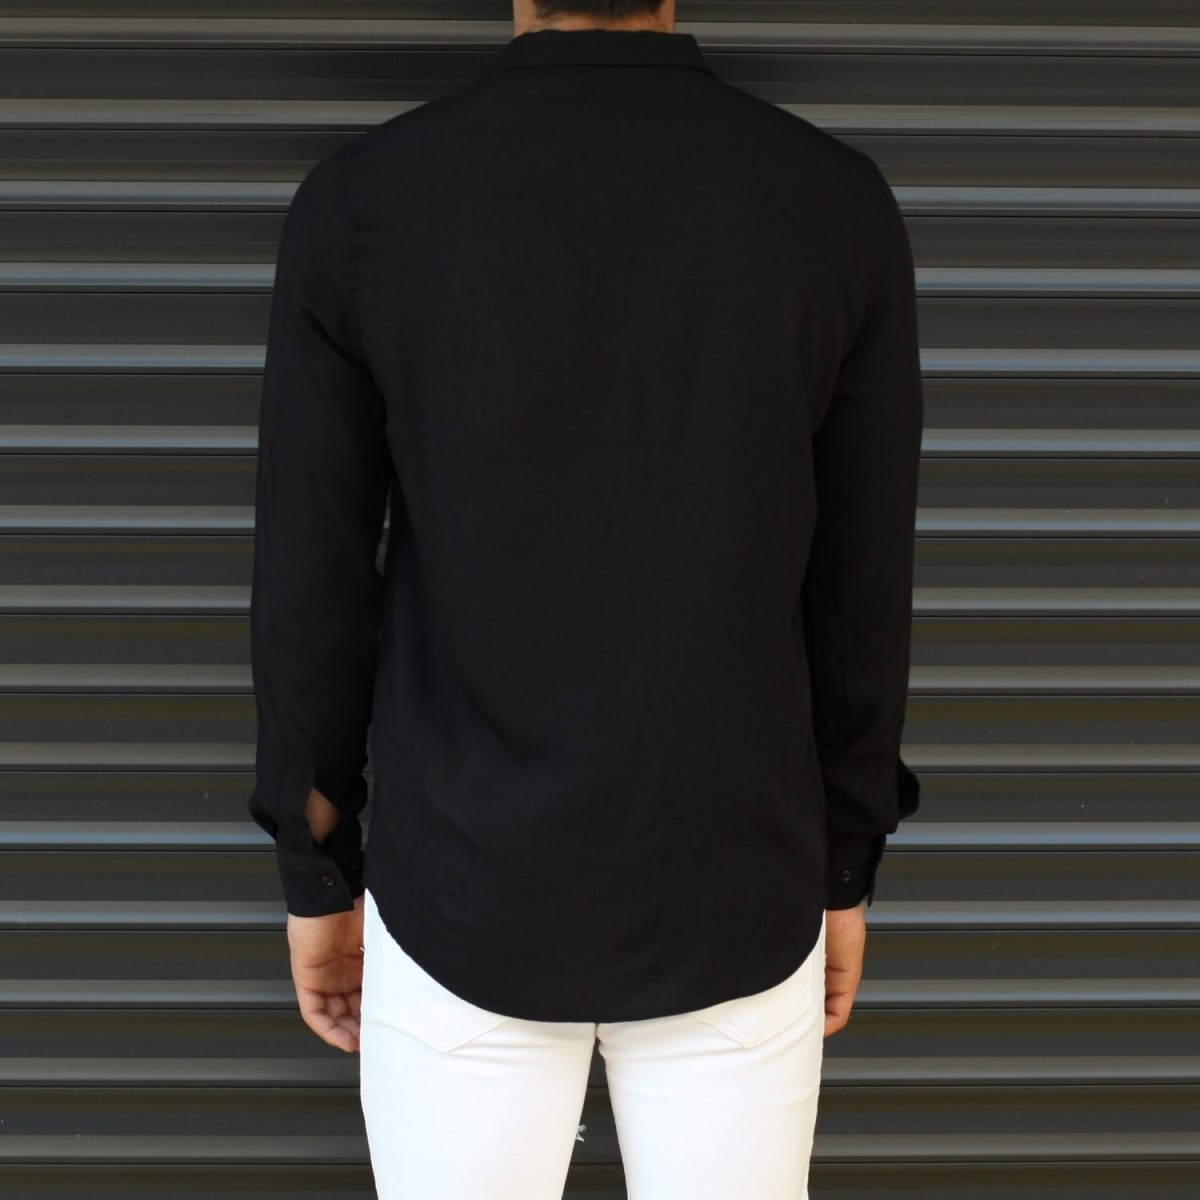 Men's Basic Stylish Casual Shirt In Solid Black Mv Premium Brand - 3